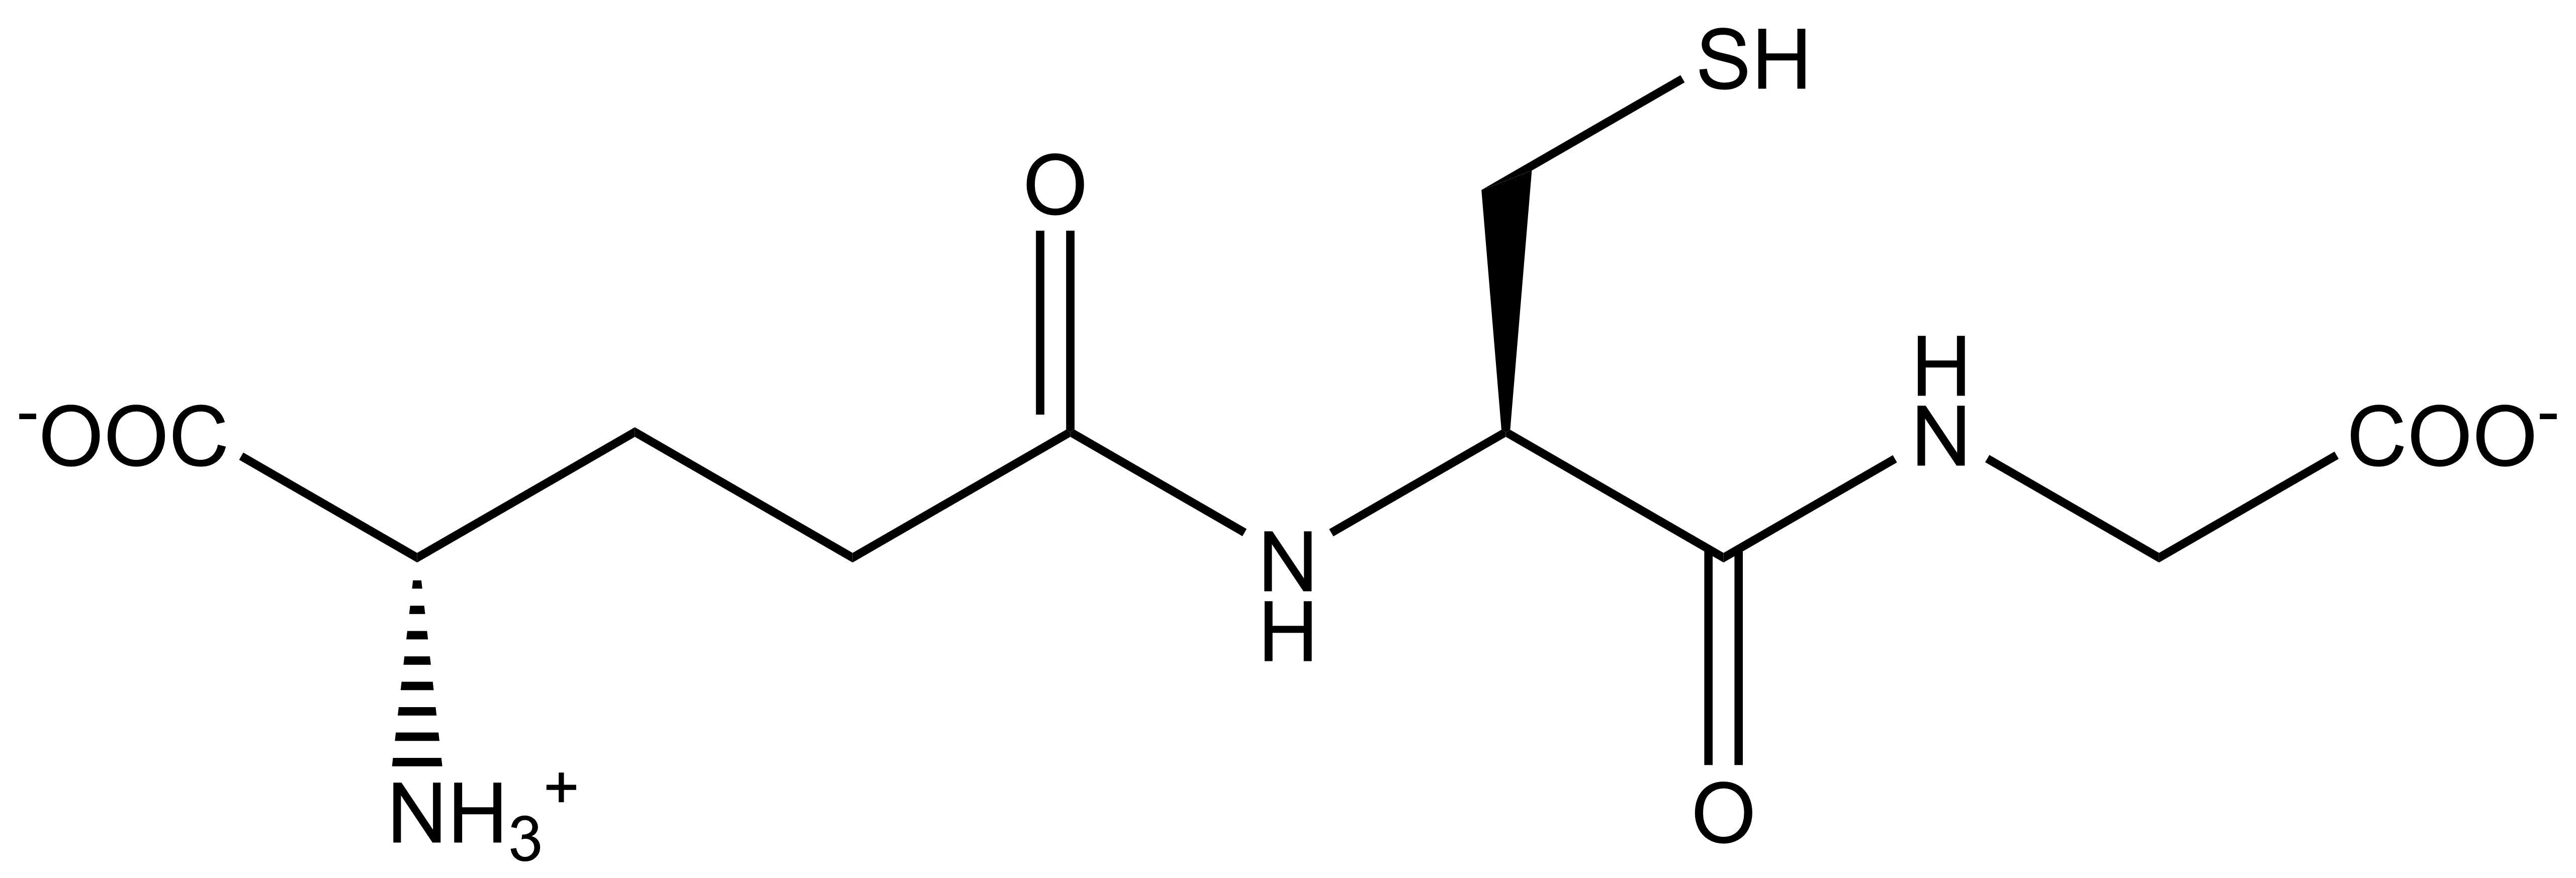 file:glutathione - wikimedia commons, Skeleton